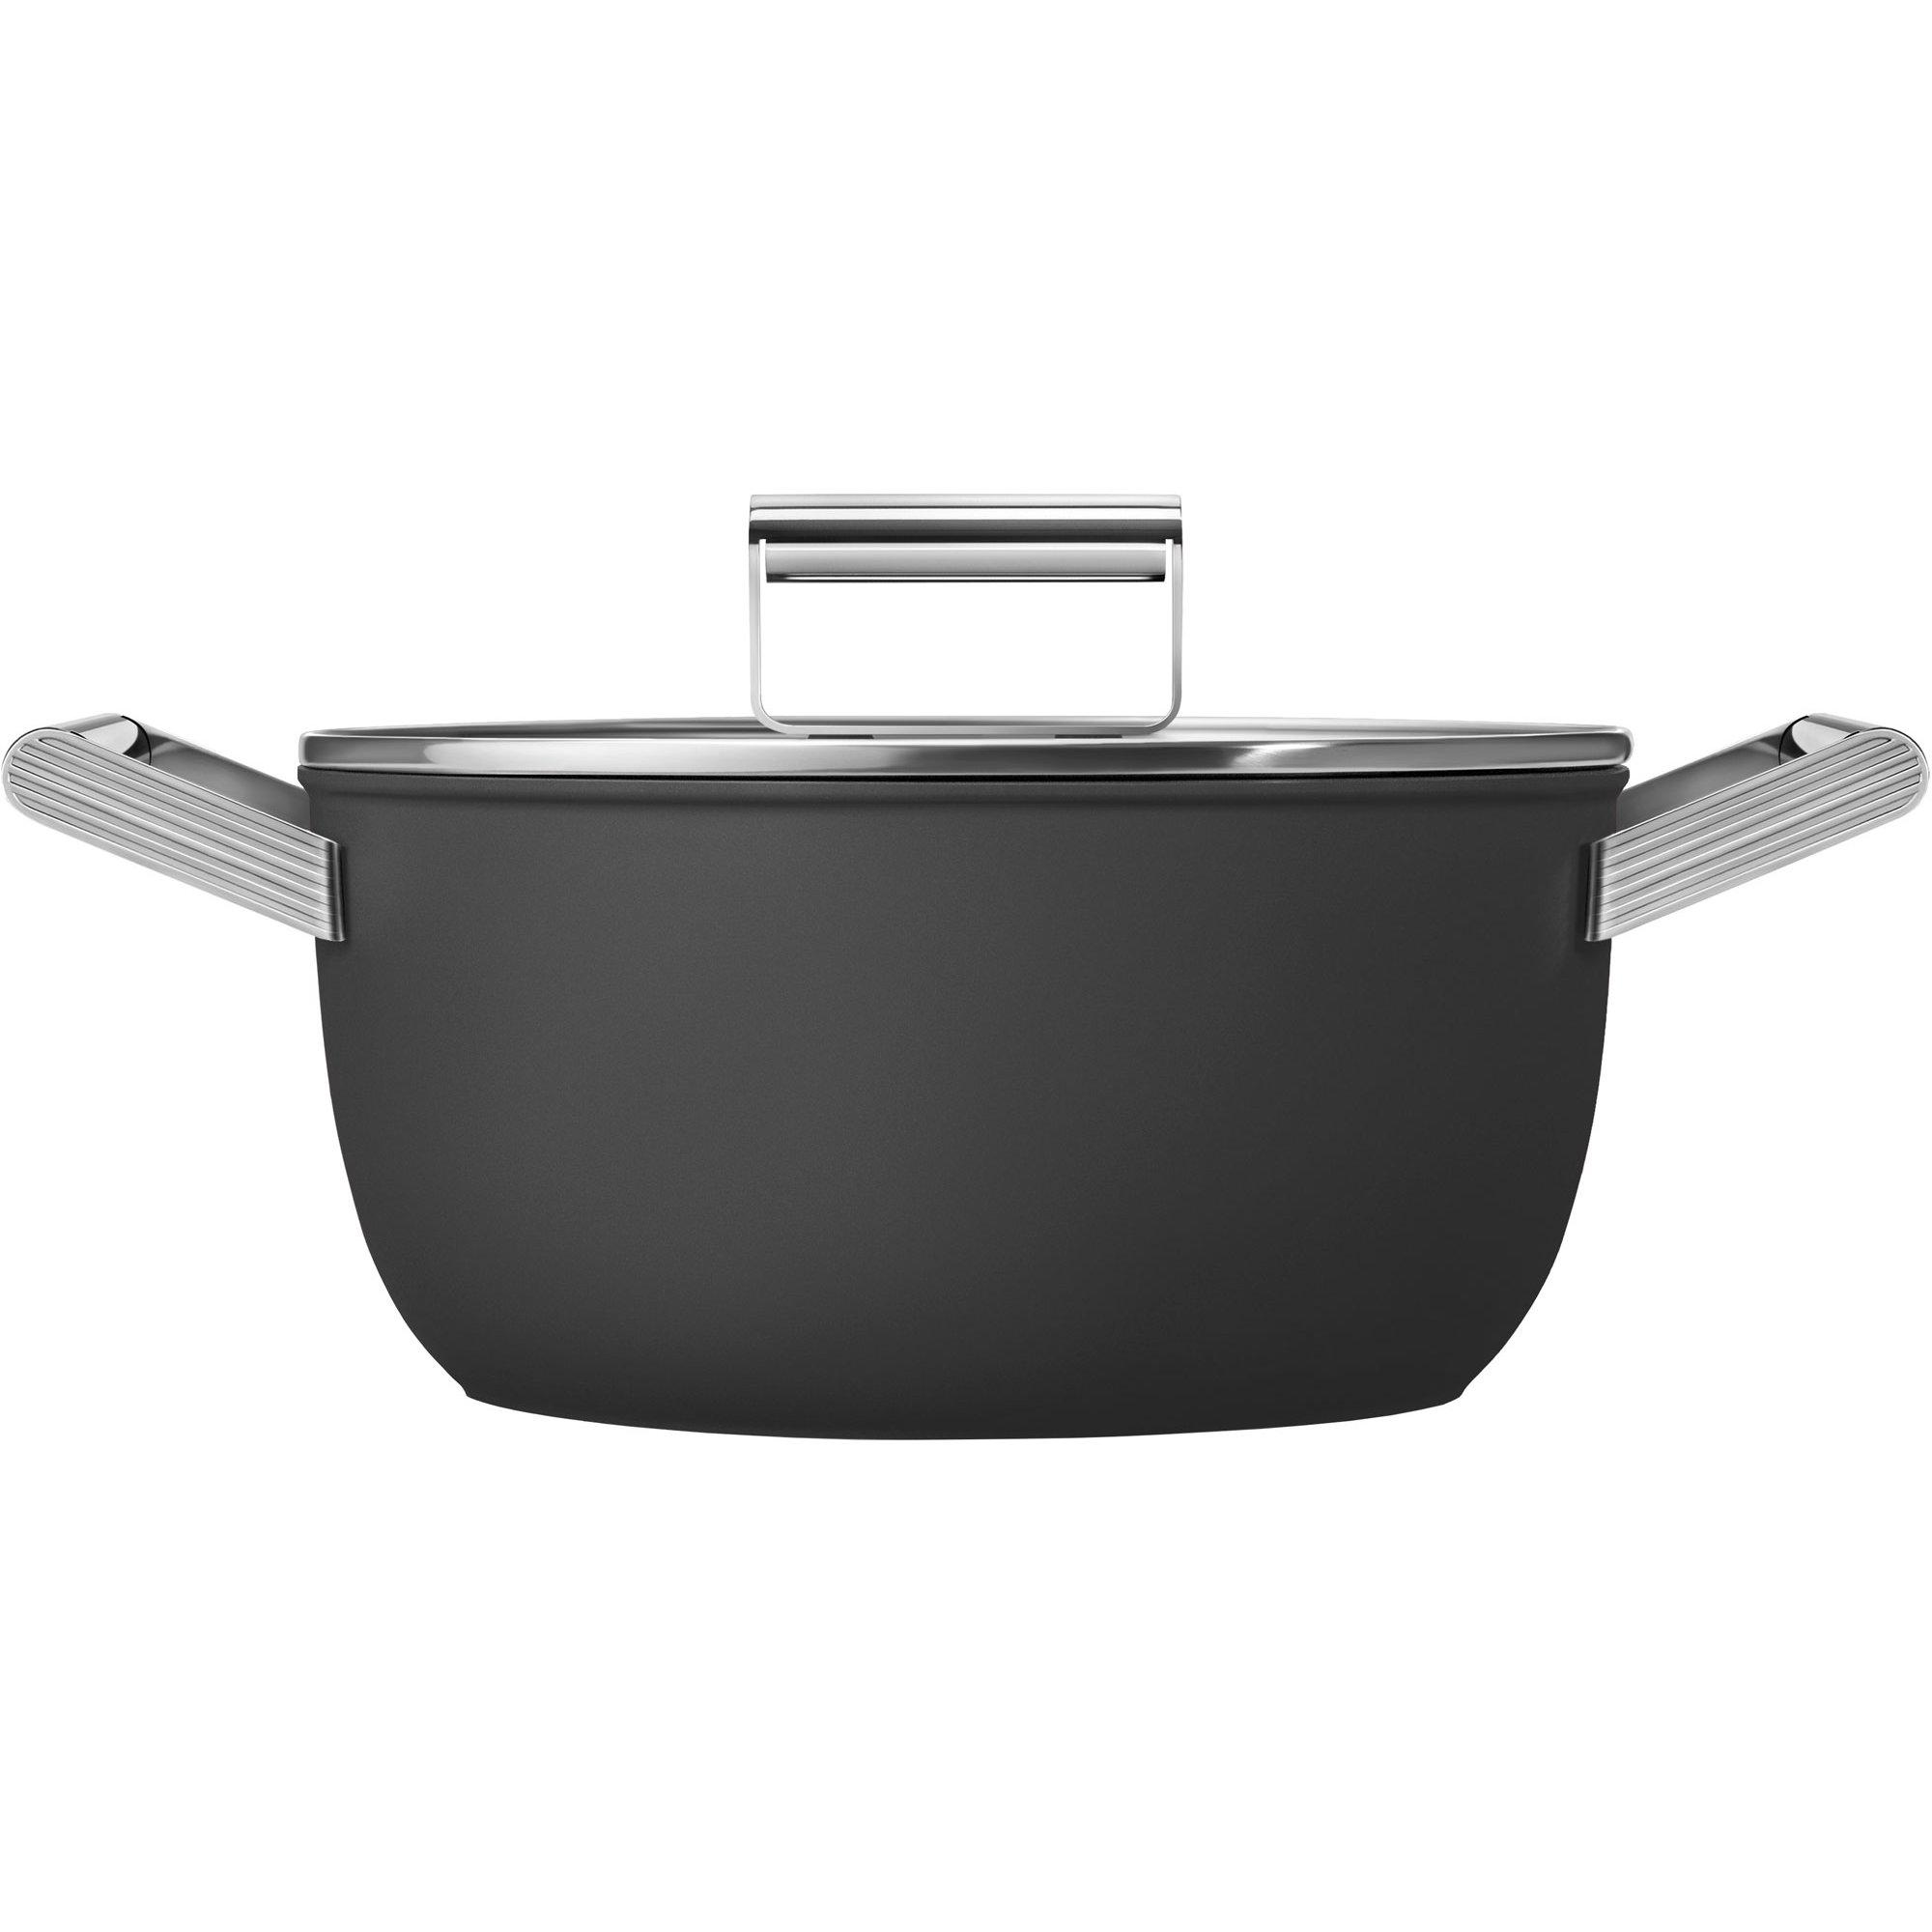 Smeg Kastrull m/lock 24 cm svart